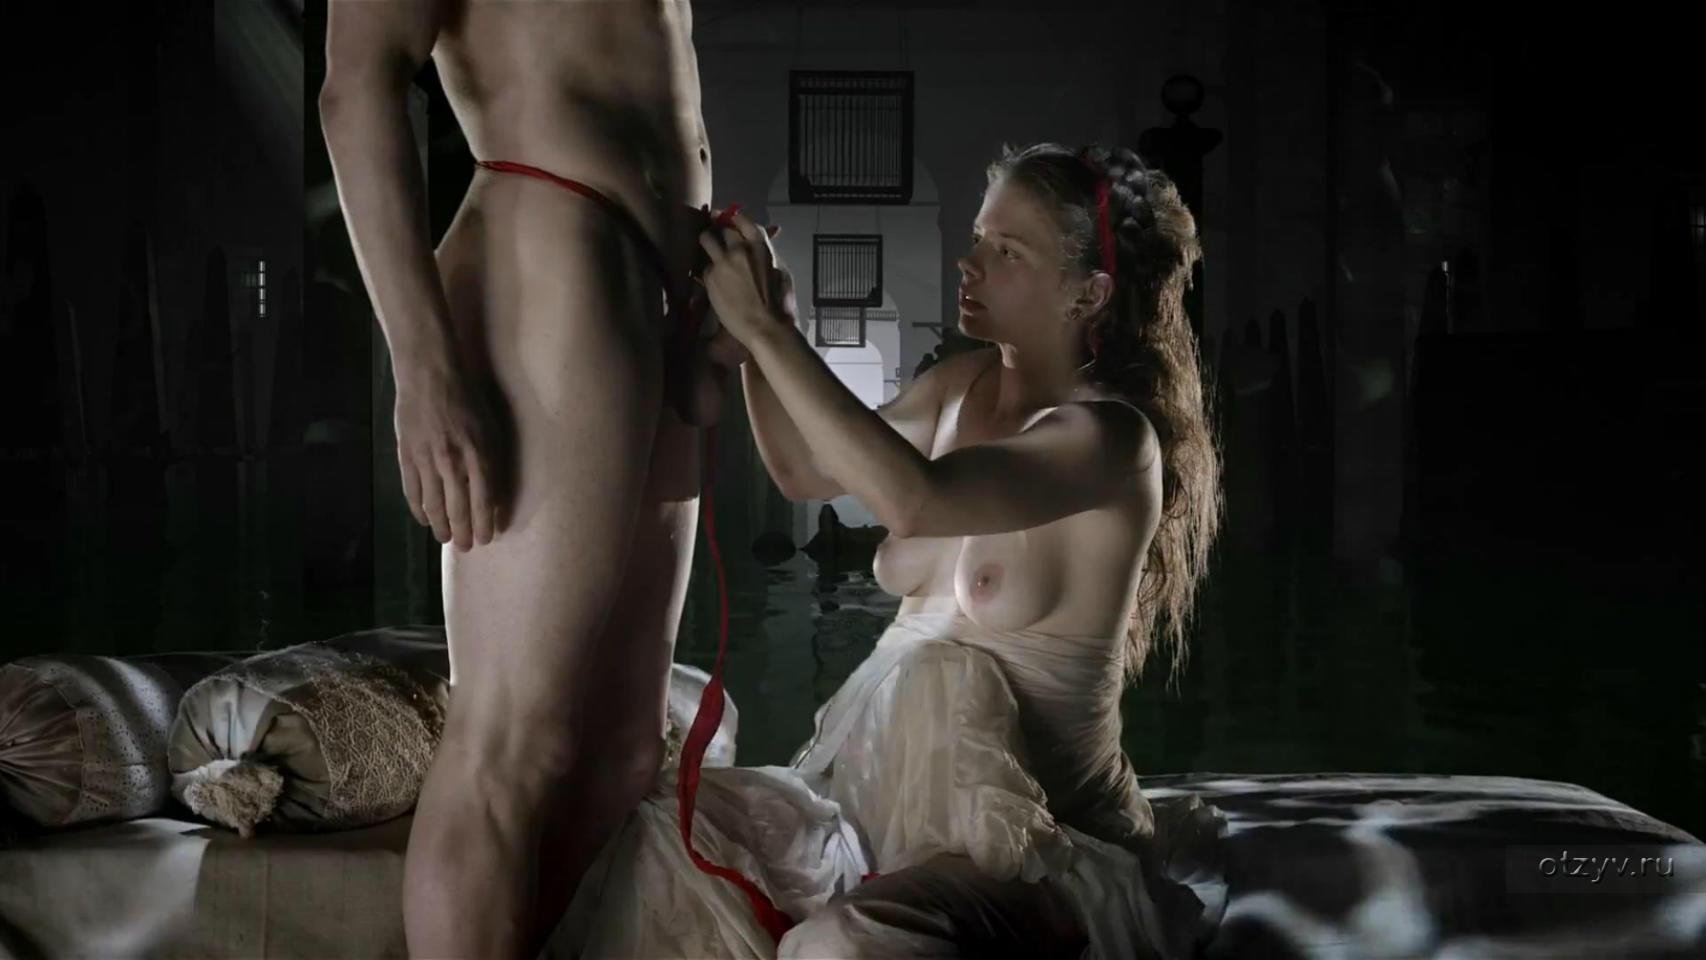 kinosayti-s-erotikoy